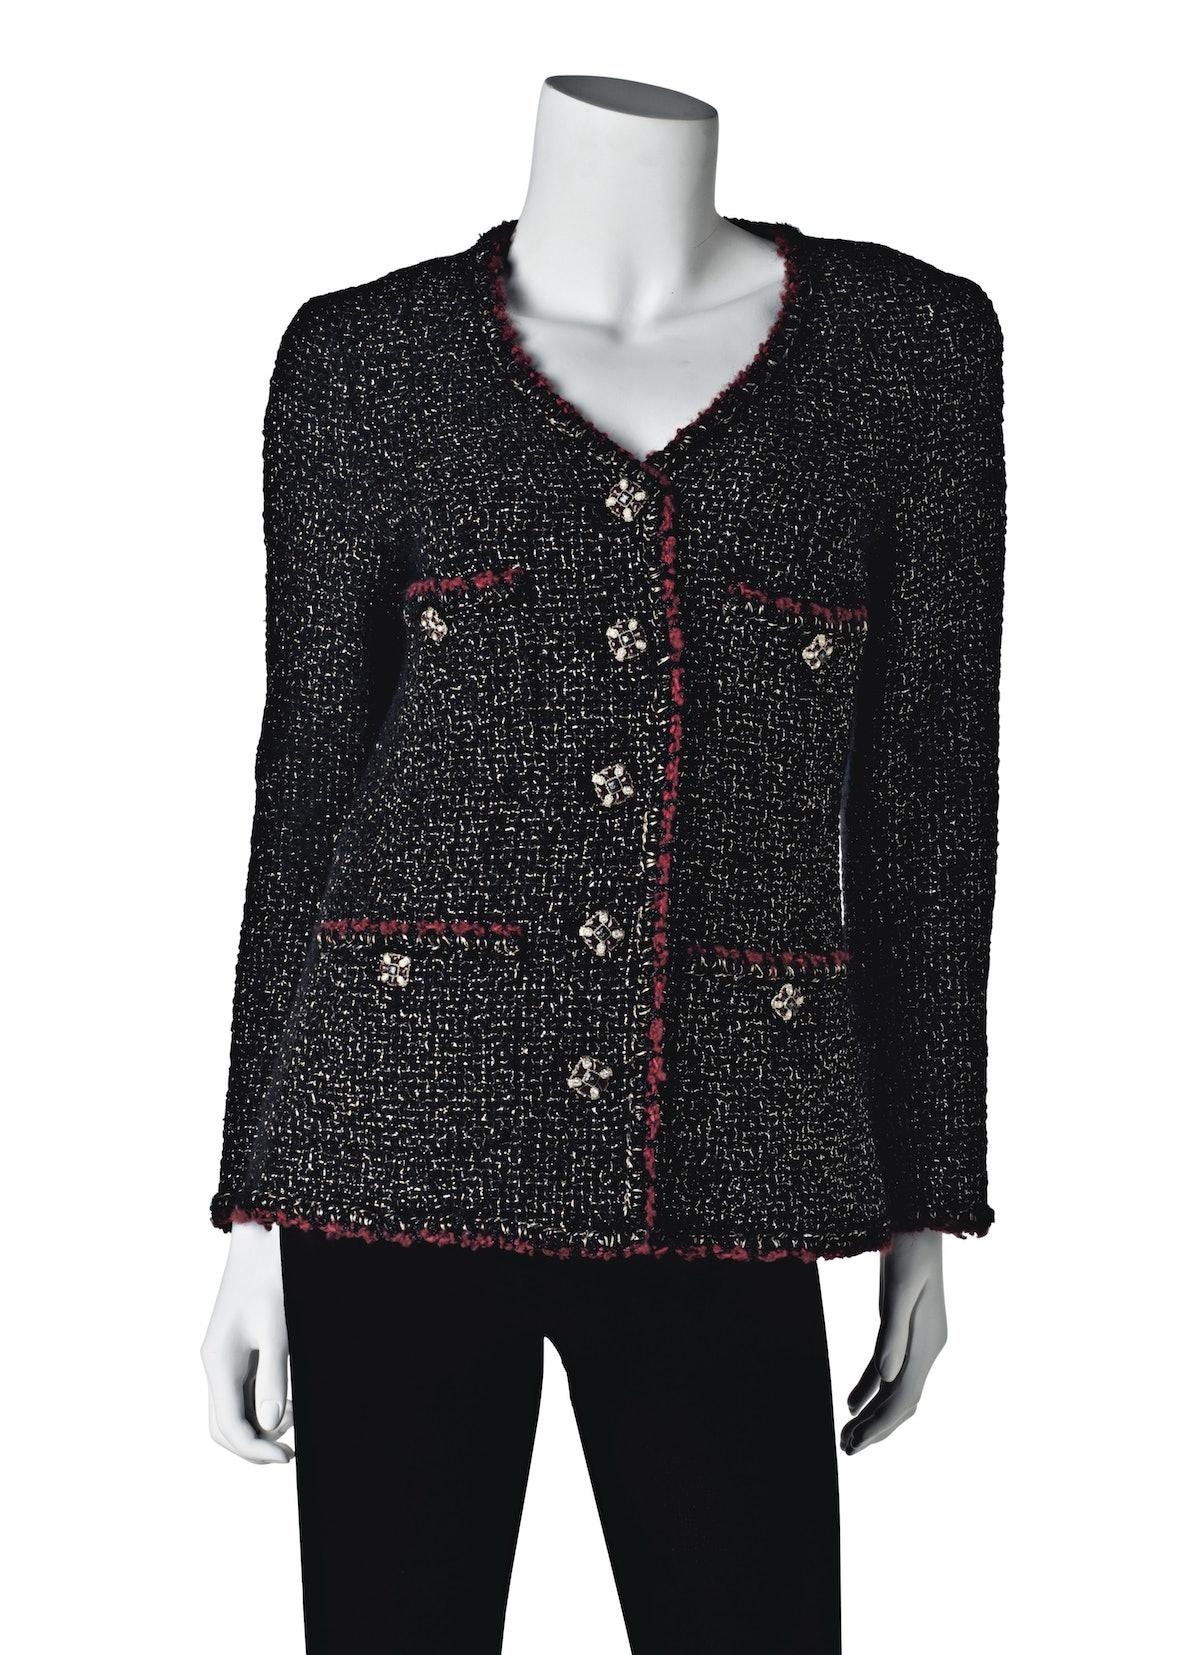 Chaneljacket.jpg